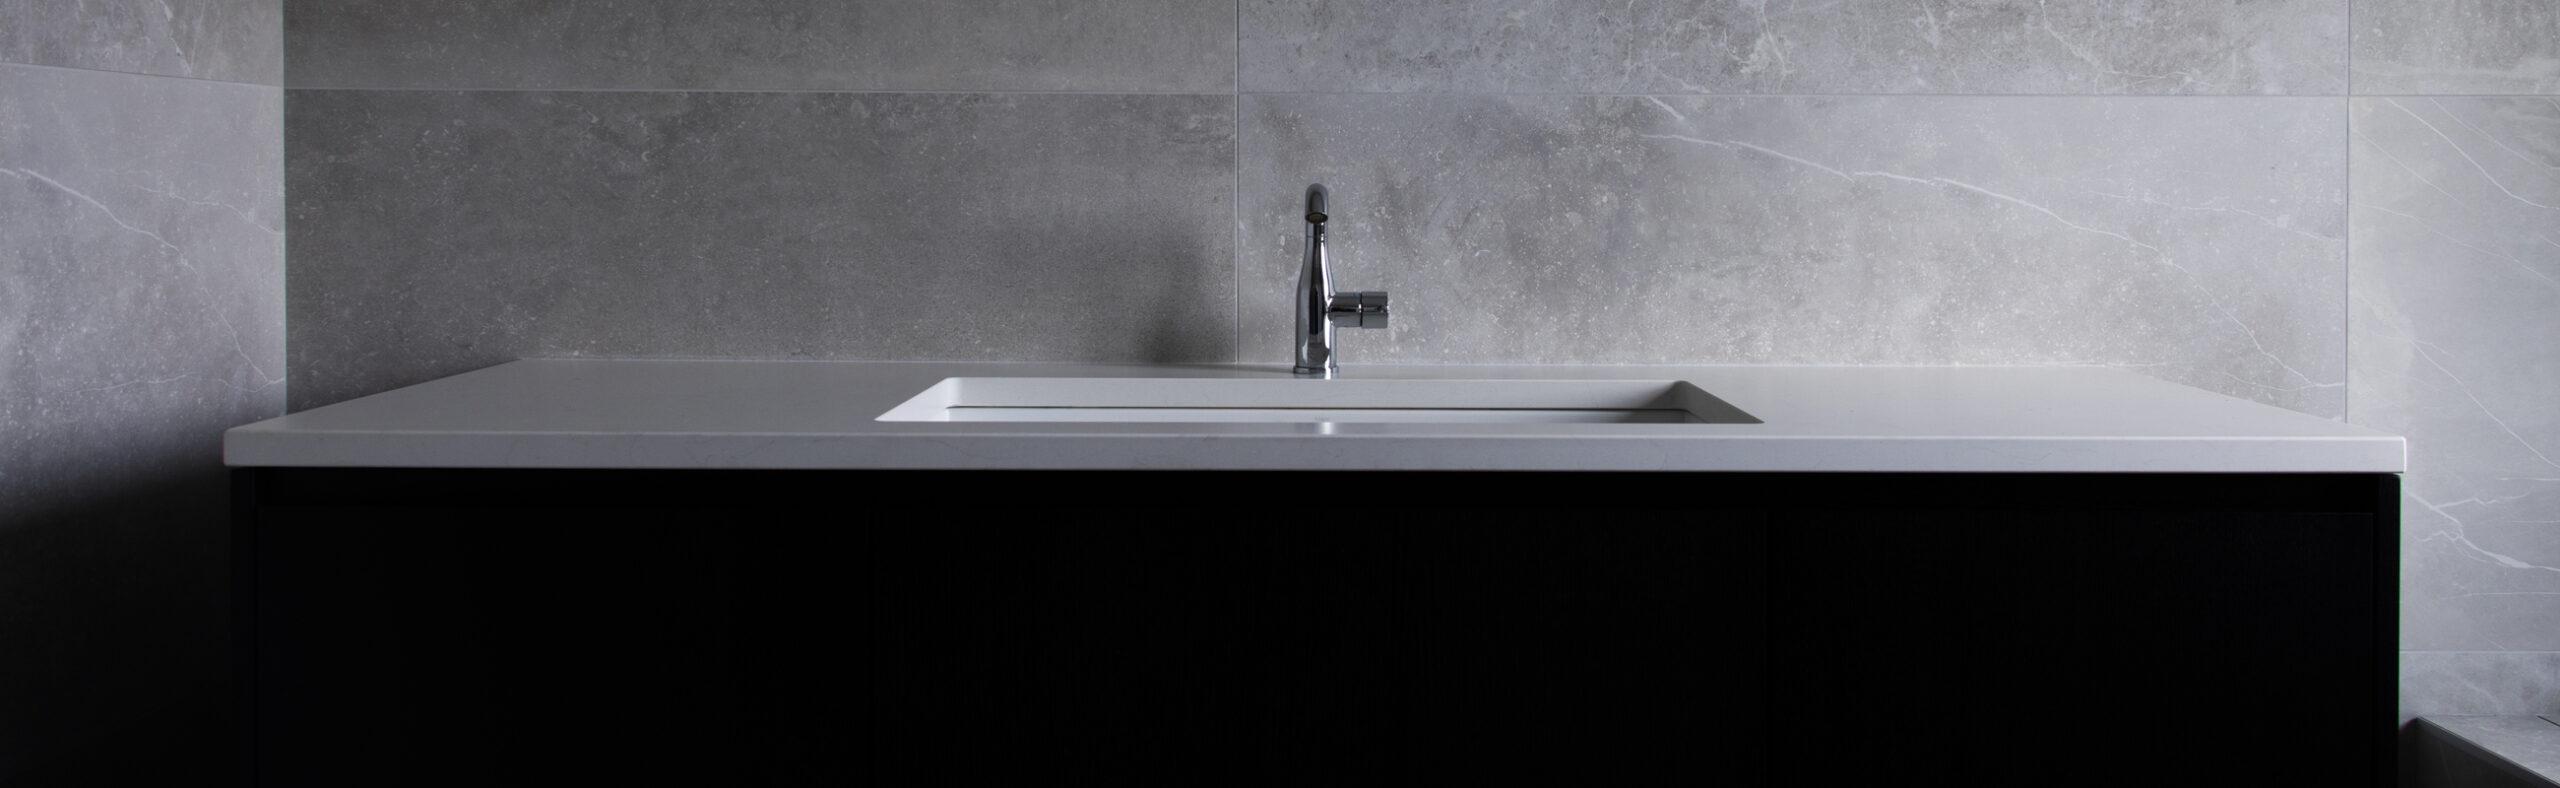 badkamers-hoofdpagina-foto